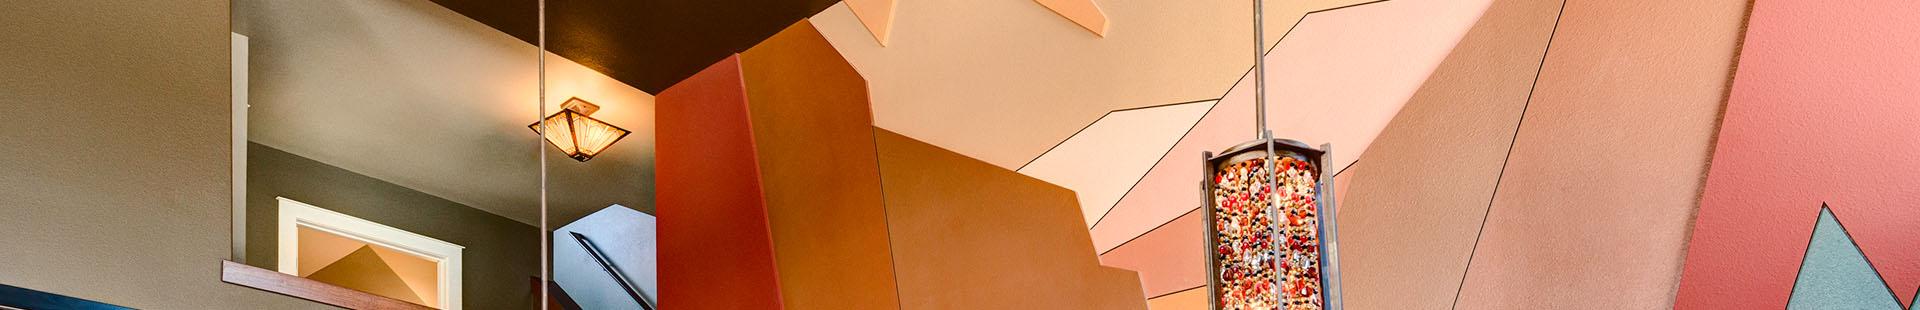 Bayside Plasterboard